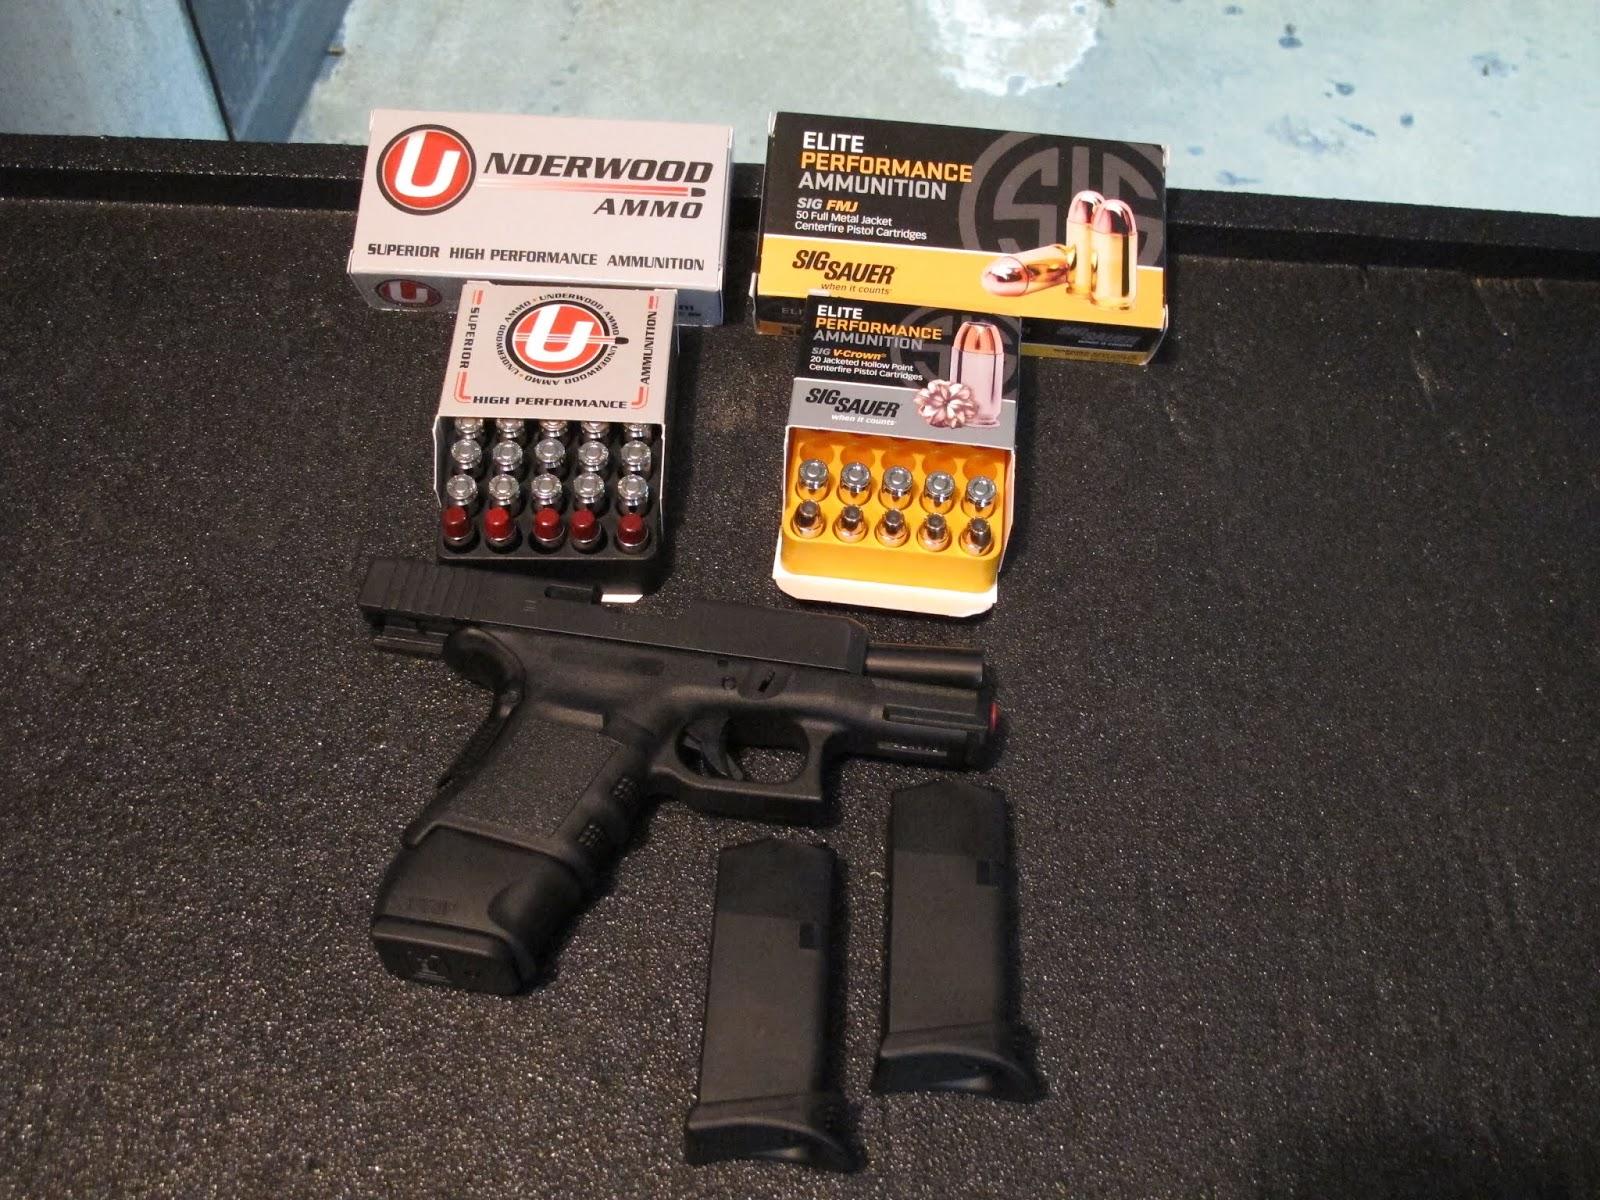 DIIZCHE SAFARI ADVENTURES Blog: Glock 29 SF (Short Frame